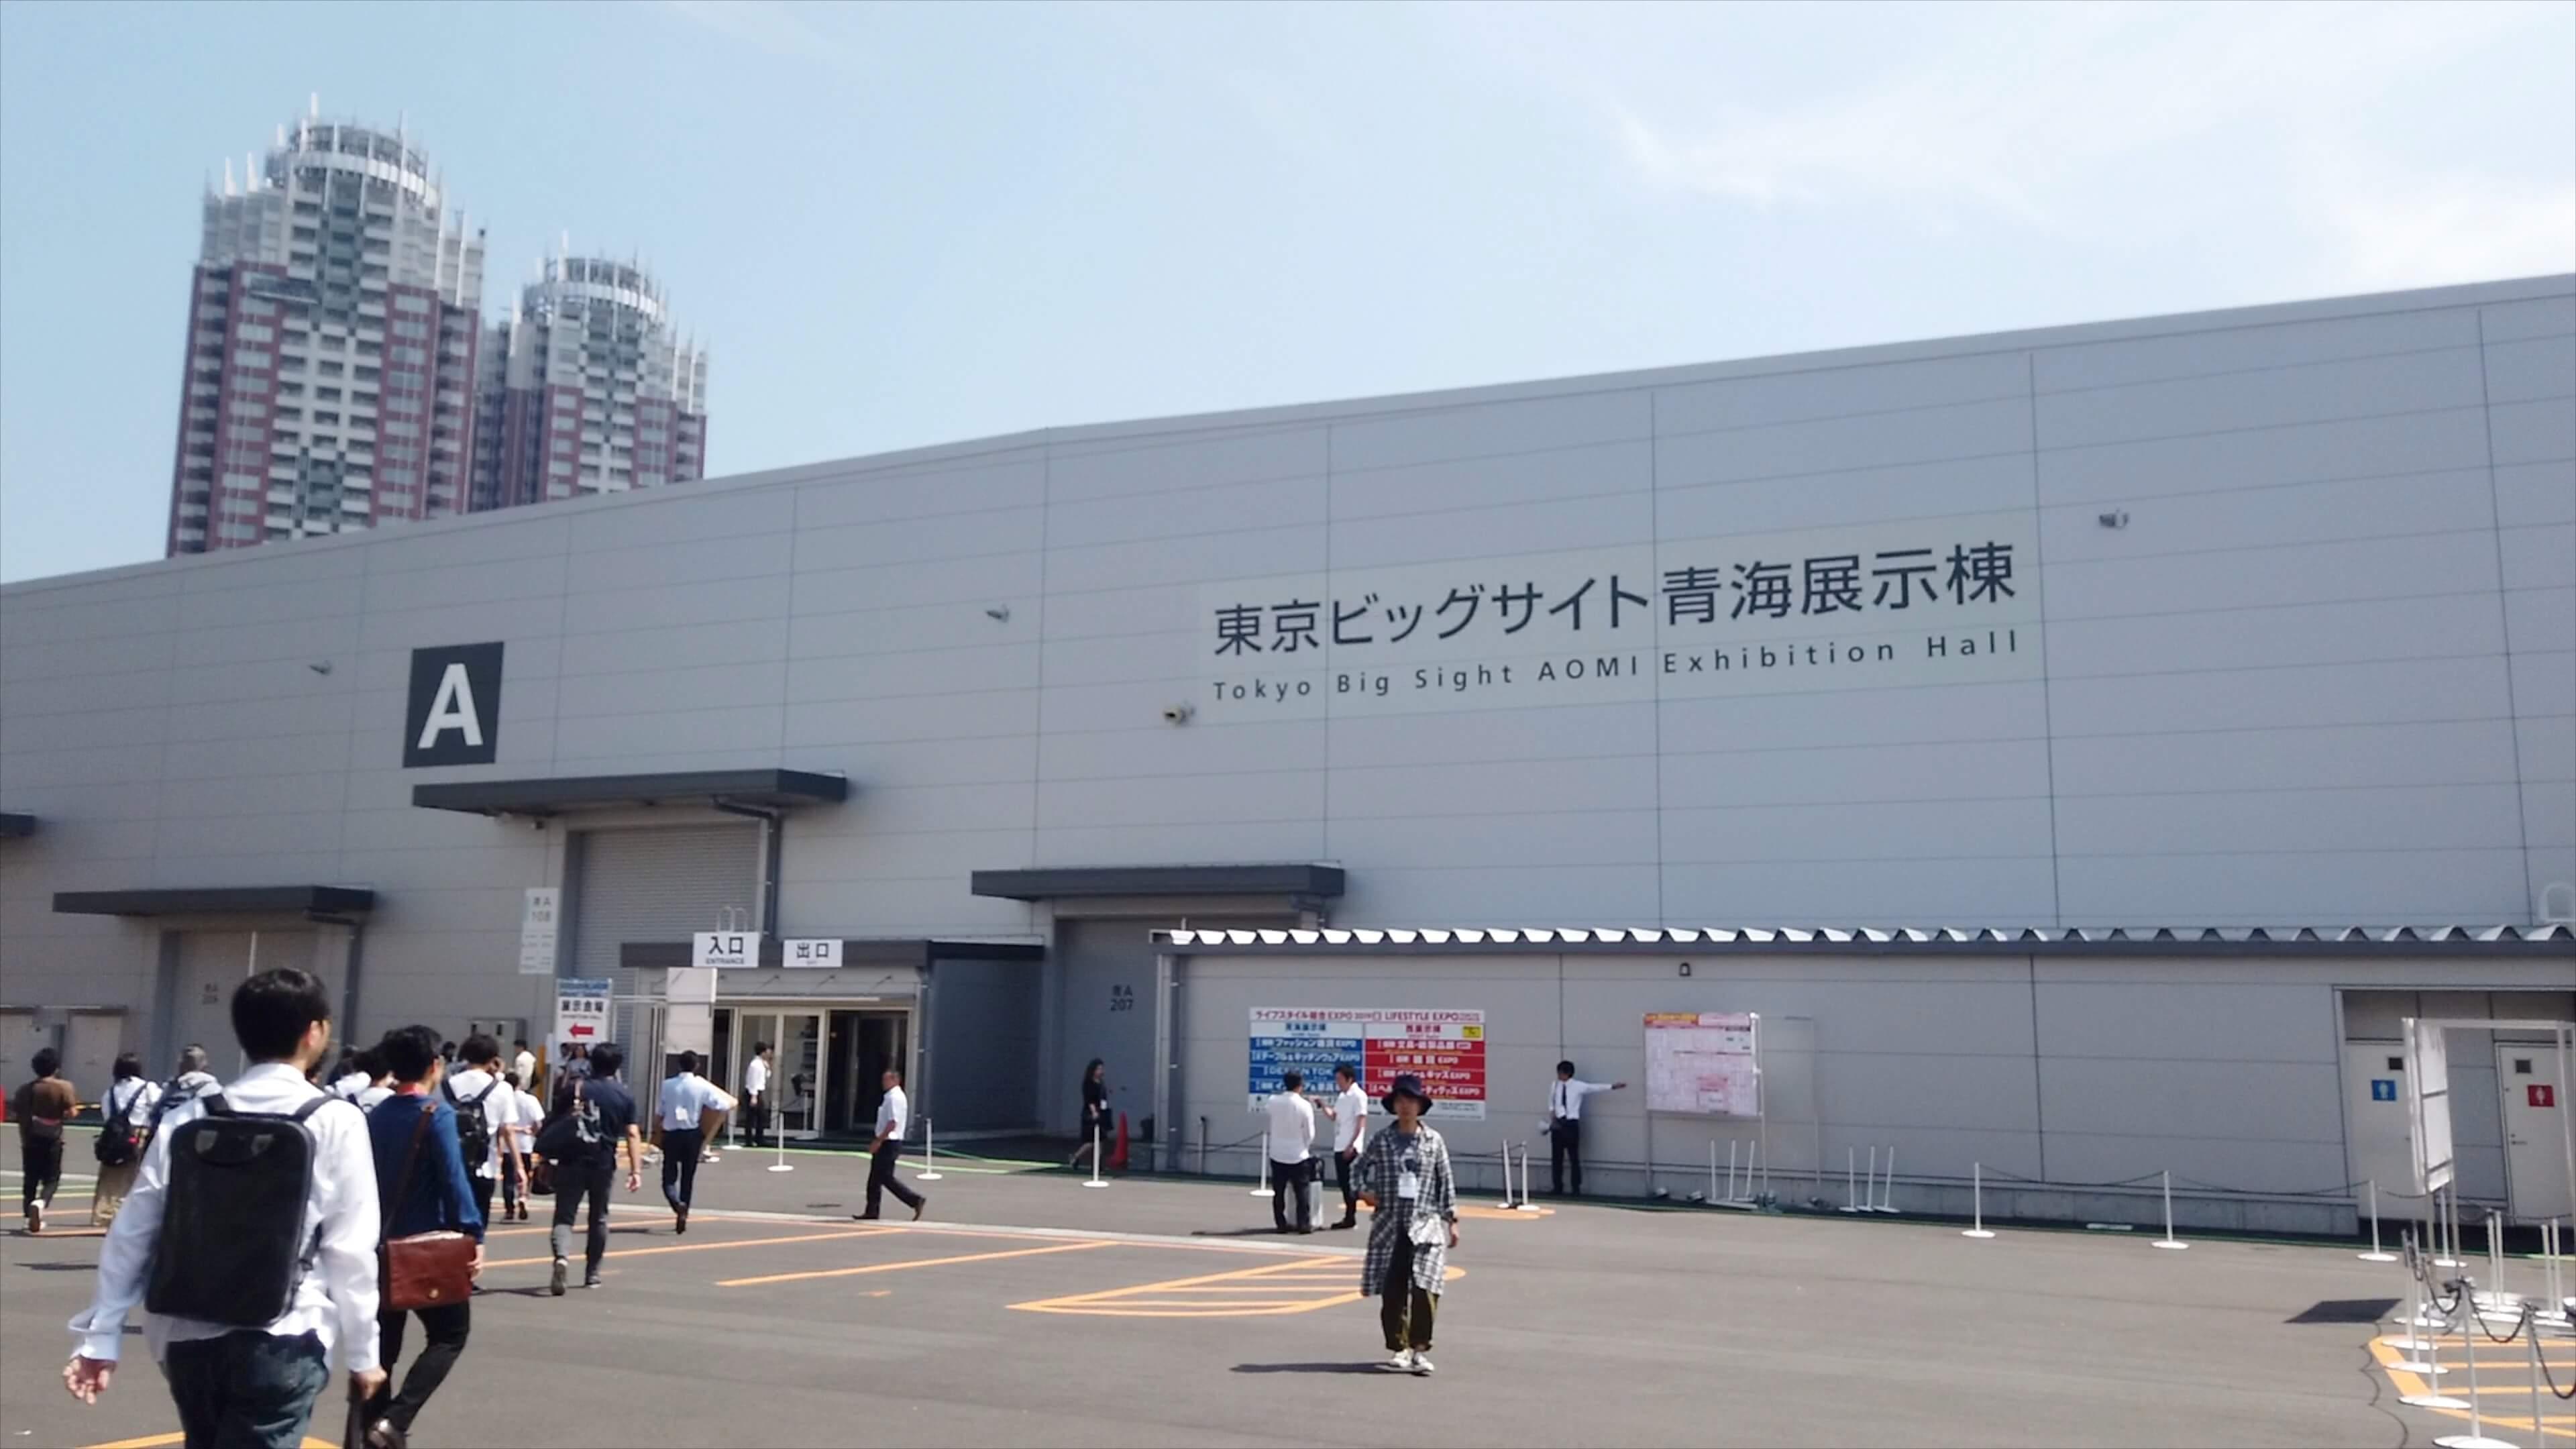 tokyo expo 2019-1 tokyo big sight aomi